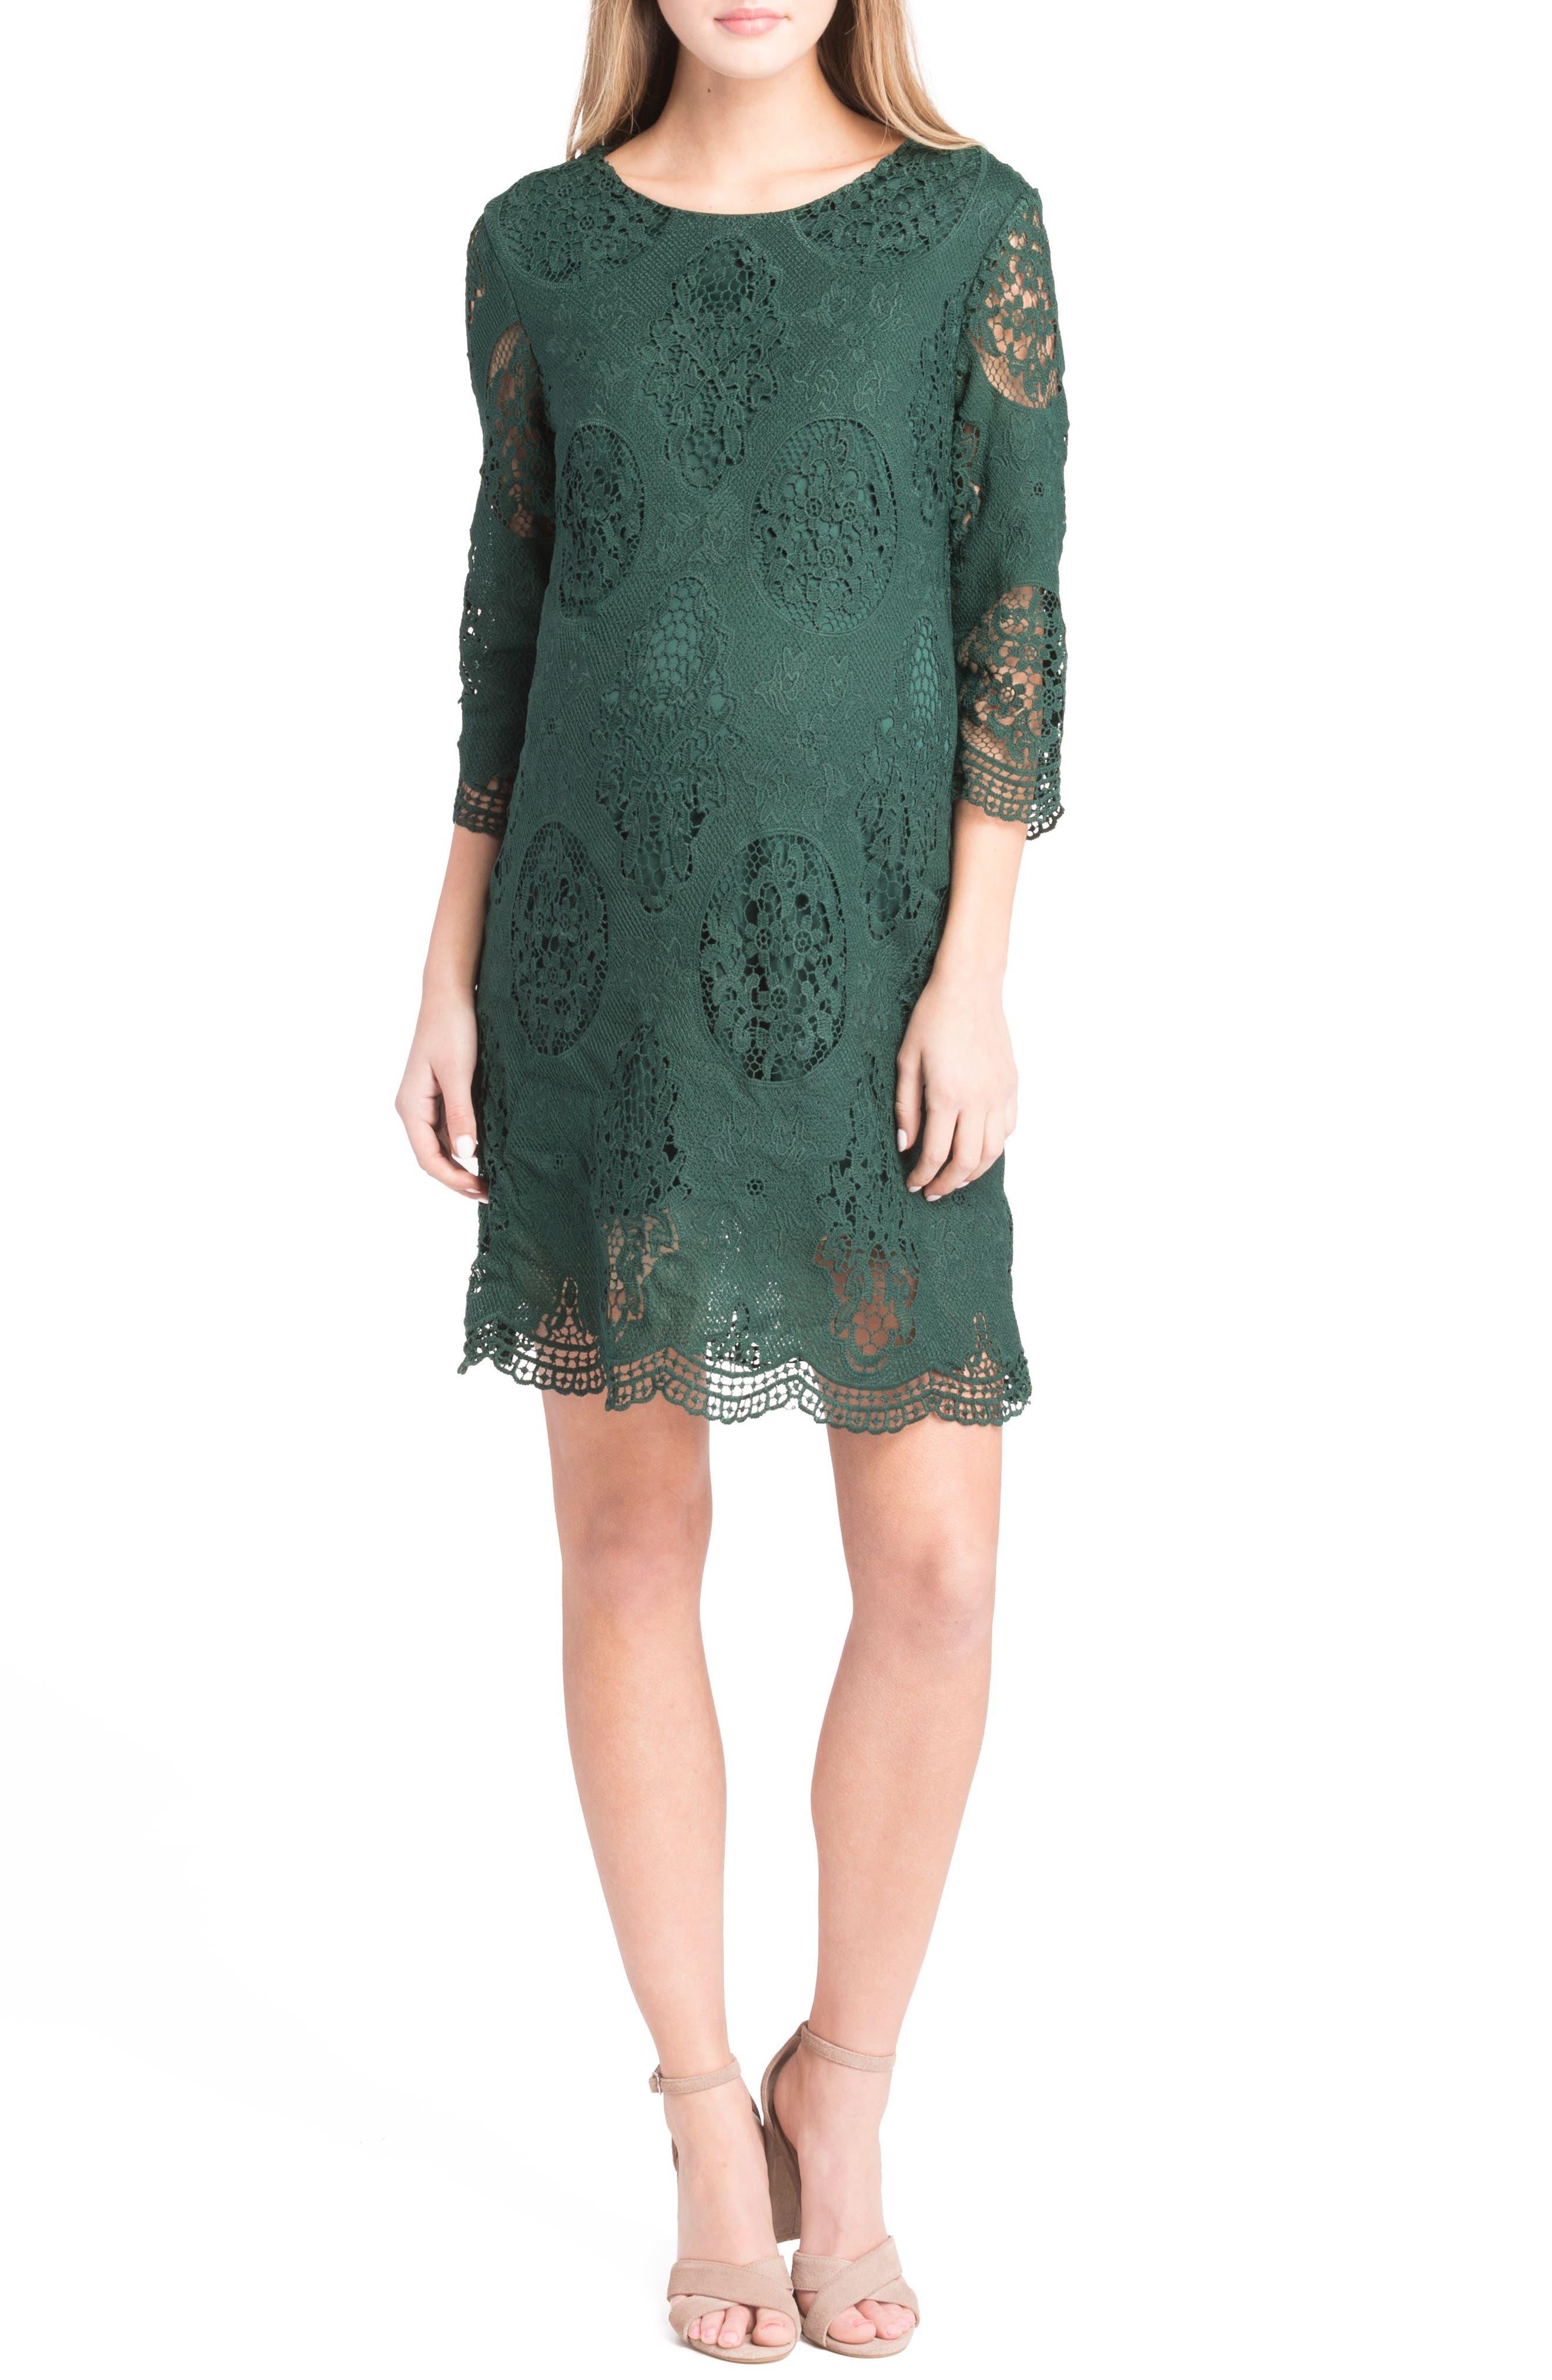 Lilac Clothing Lace Maternity Dress